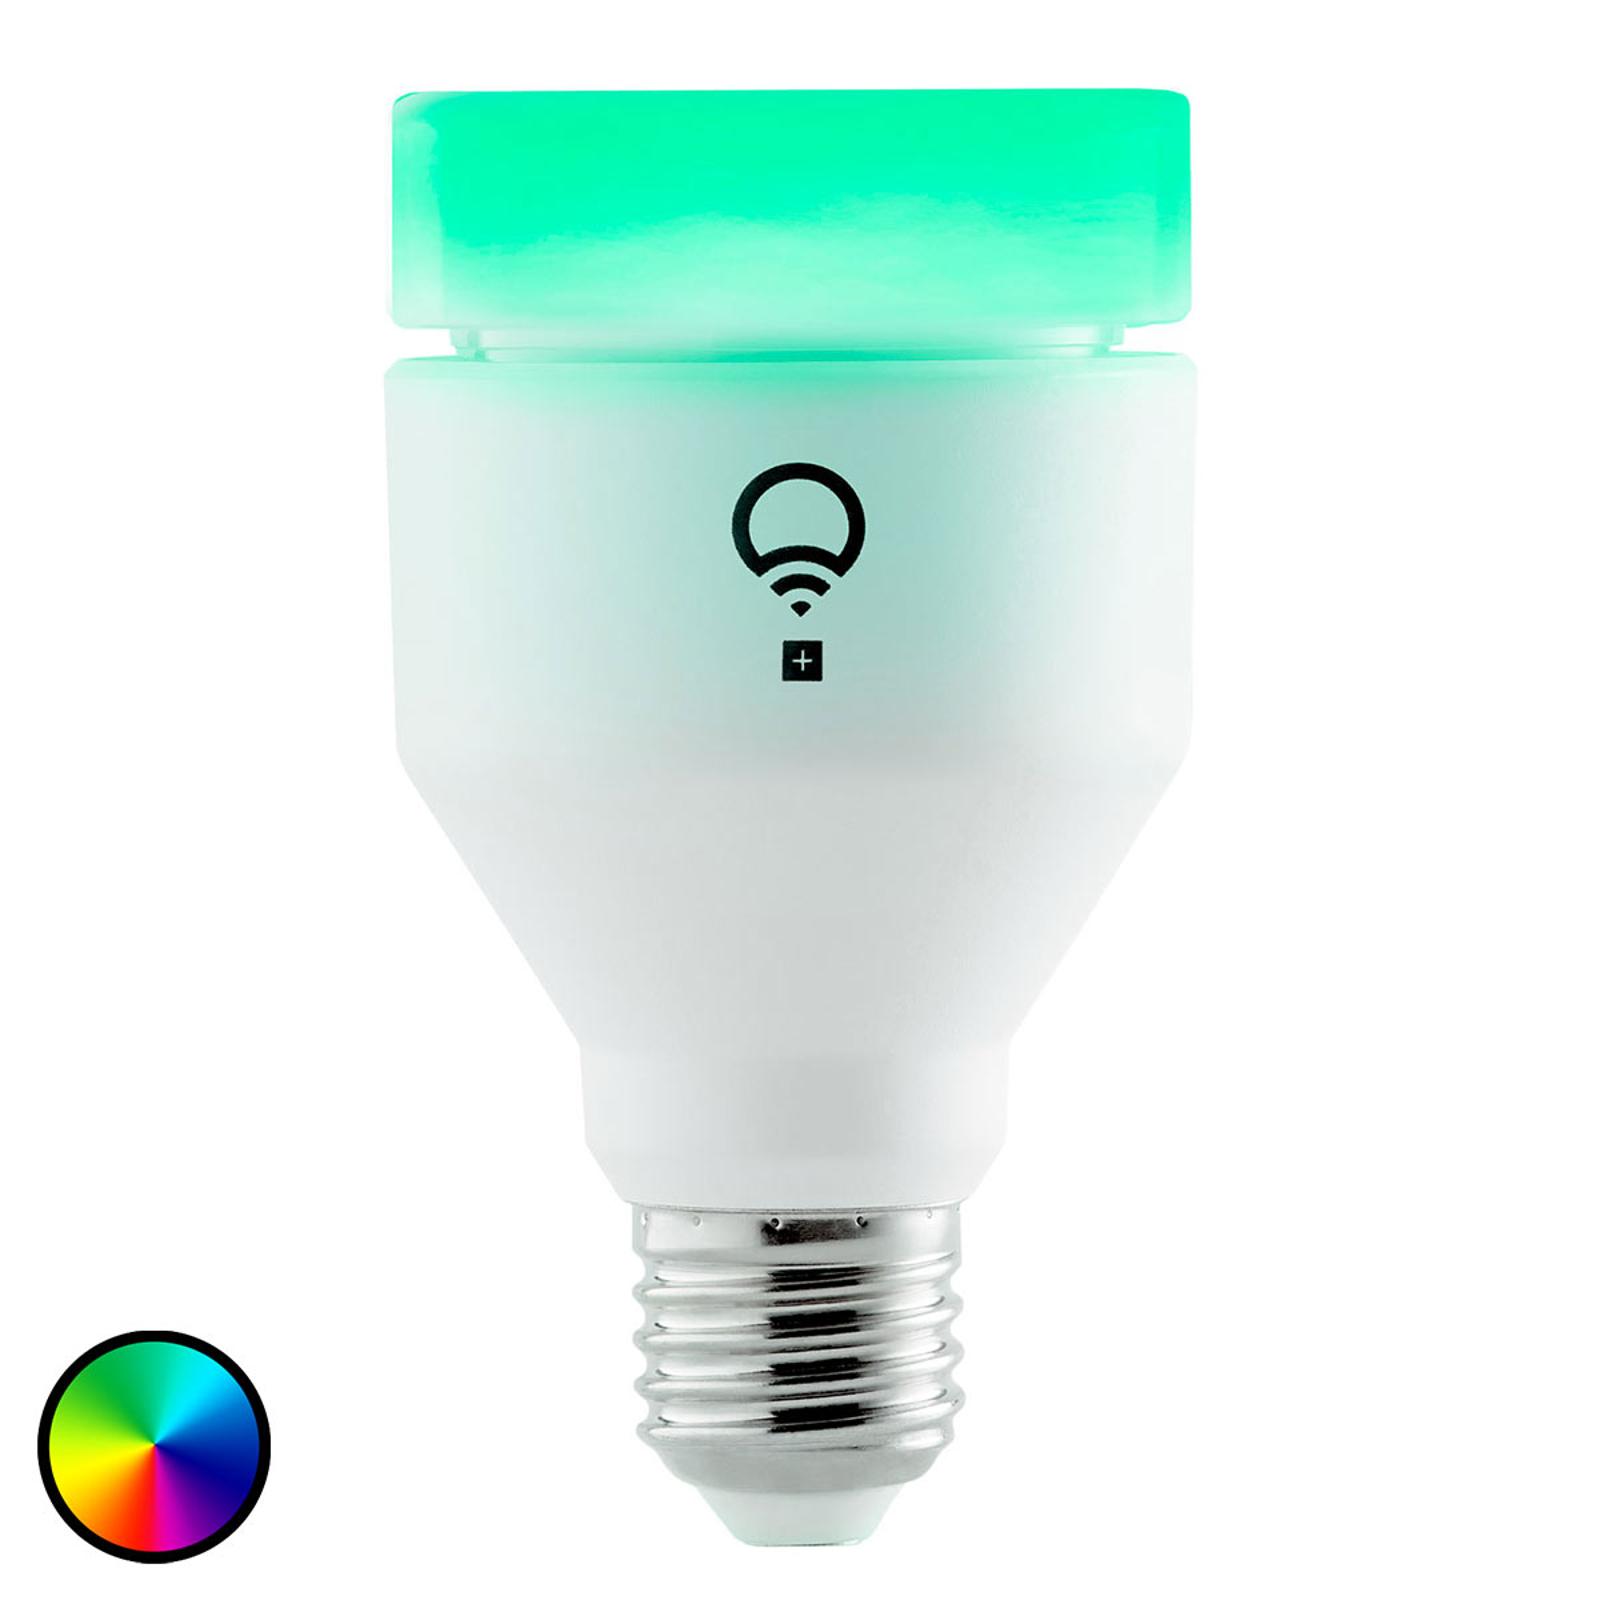 LIFX Nightvision ampoule LED E27 11W, RGBW, WiFi